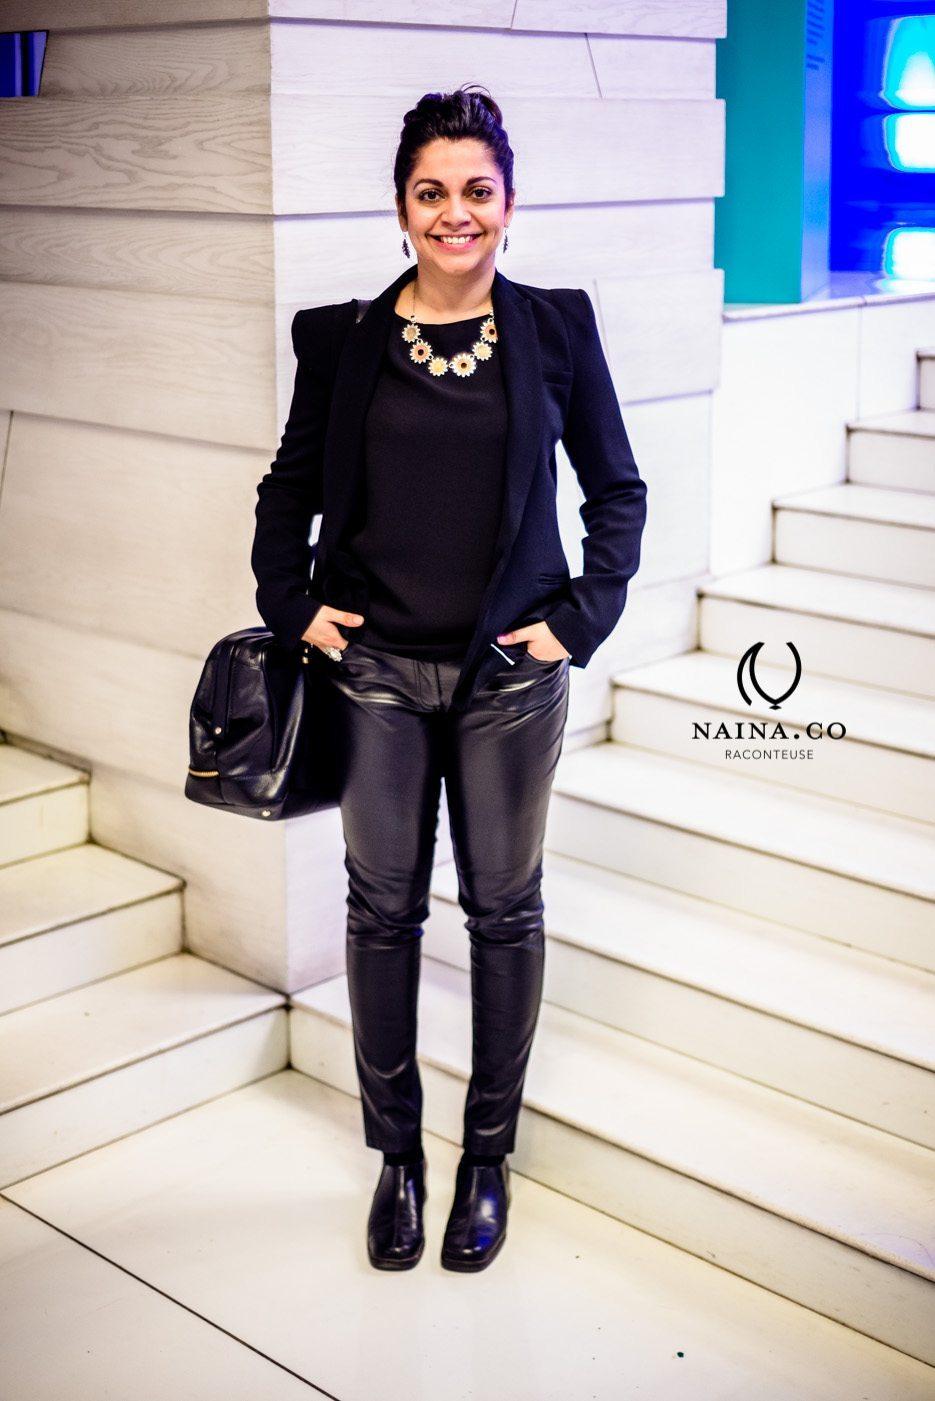 Naina.co-Raconteuse-Storyteller-Photographer-Luxury-Starwood-Le-Meridien-Delhi-India-Art-Fair-CoverUp